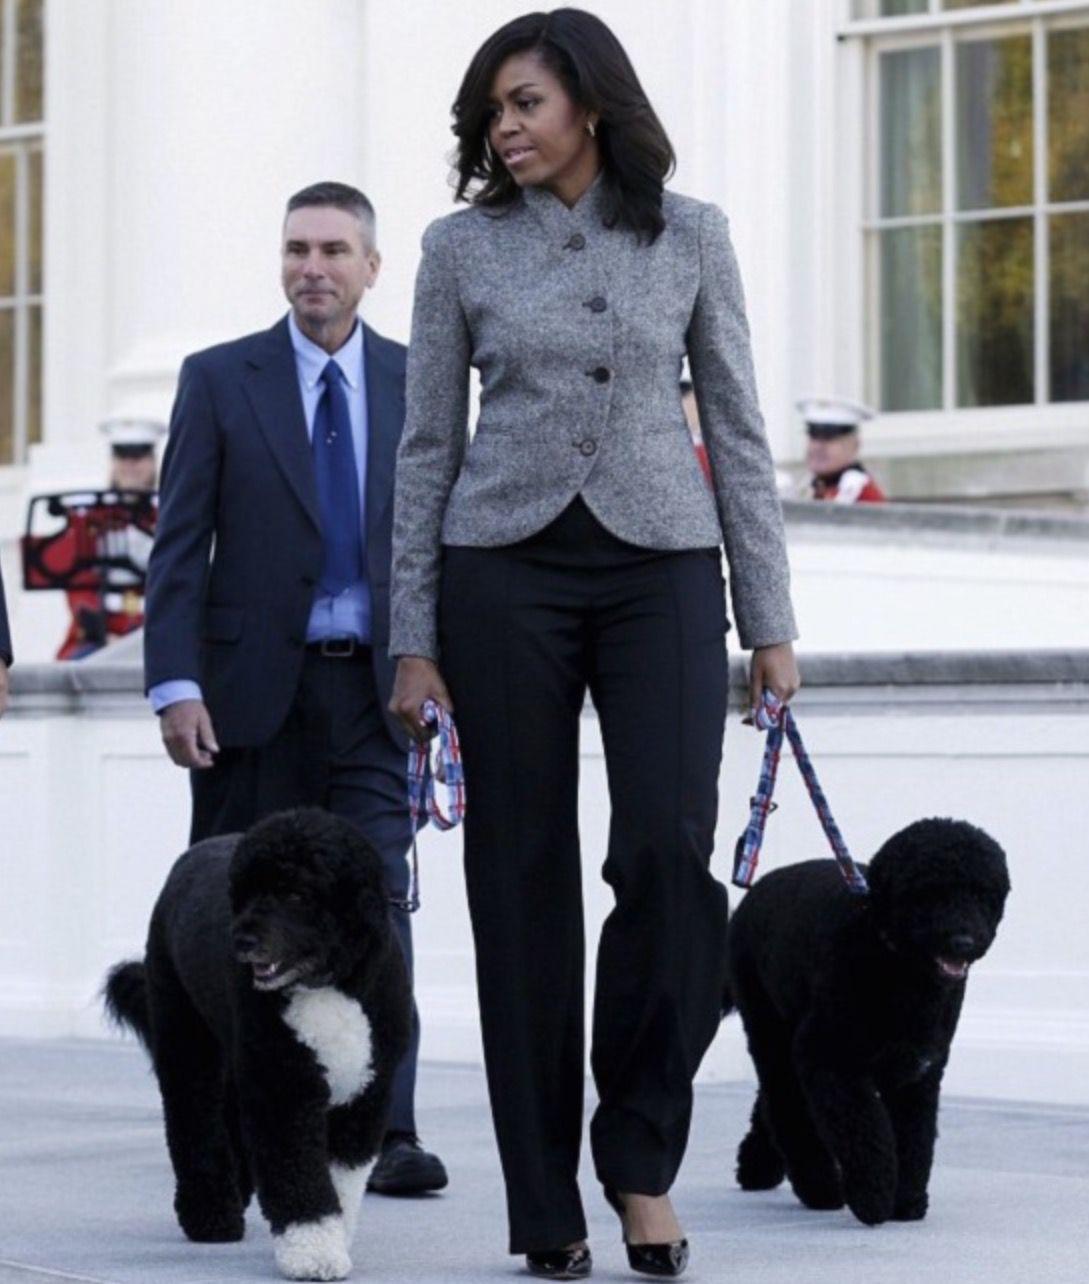 Pin by Adriana Mckenzi on Men's | Michelle obama fashion, Michelle